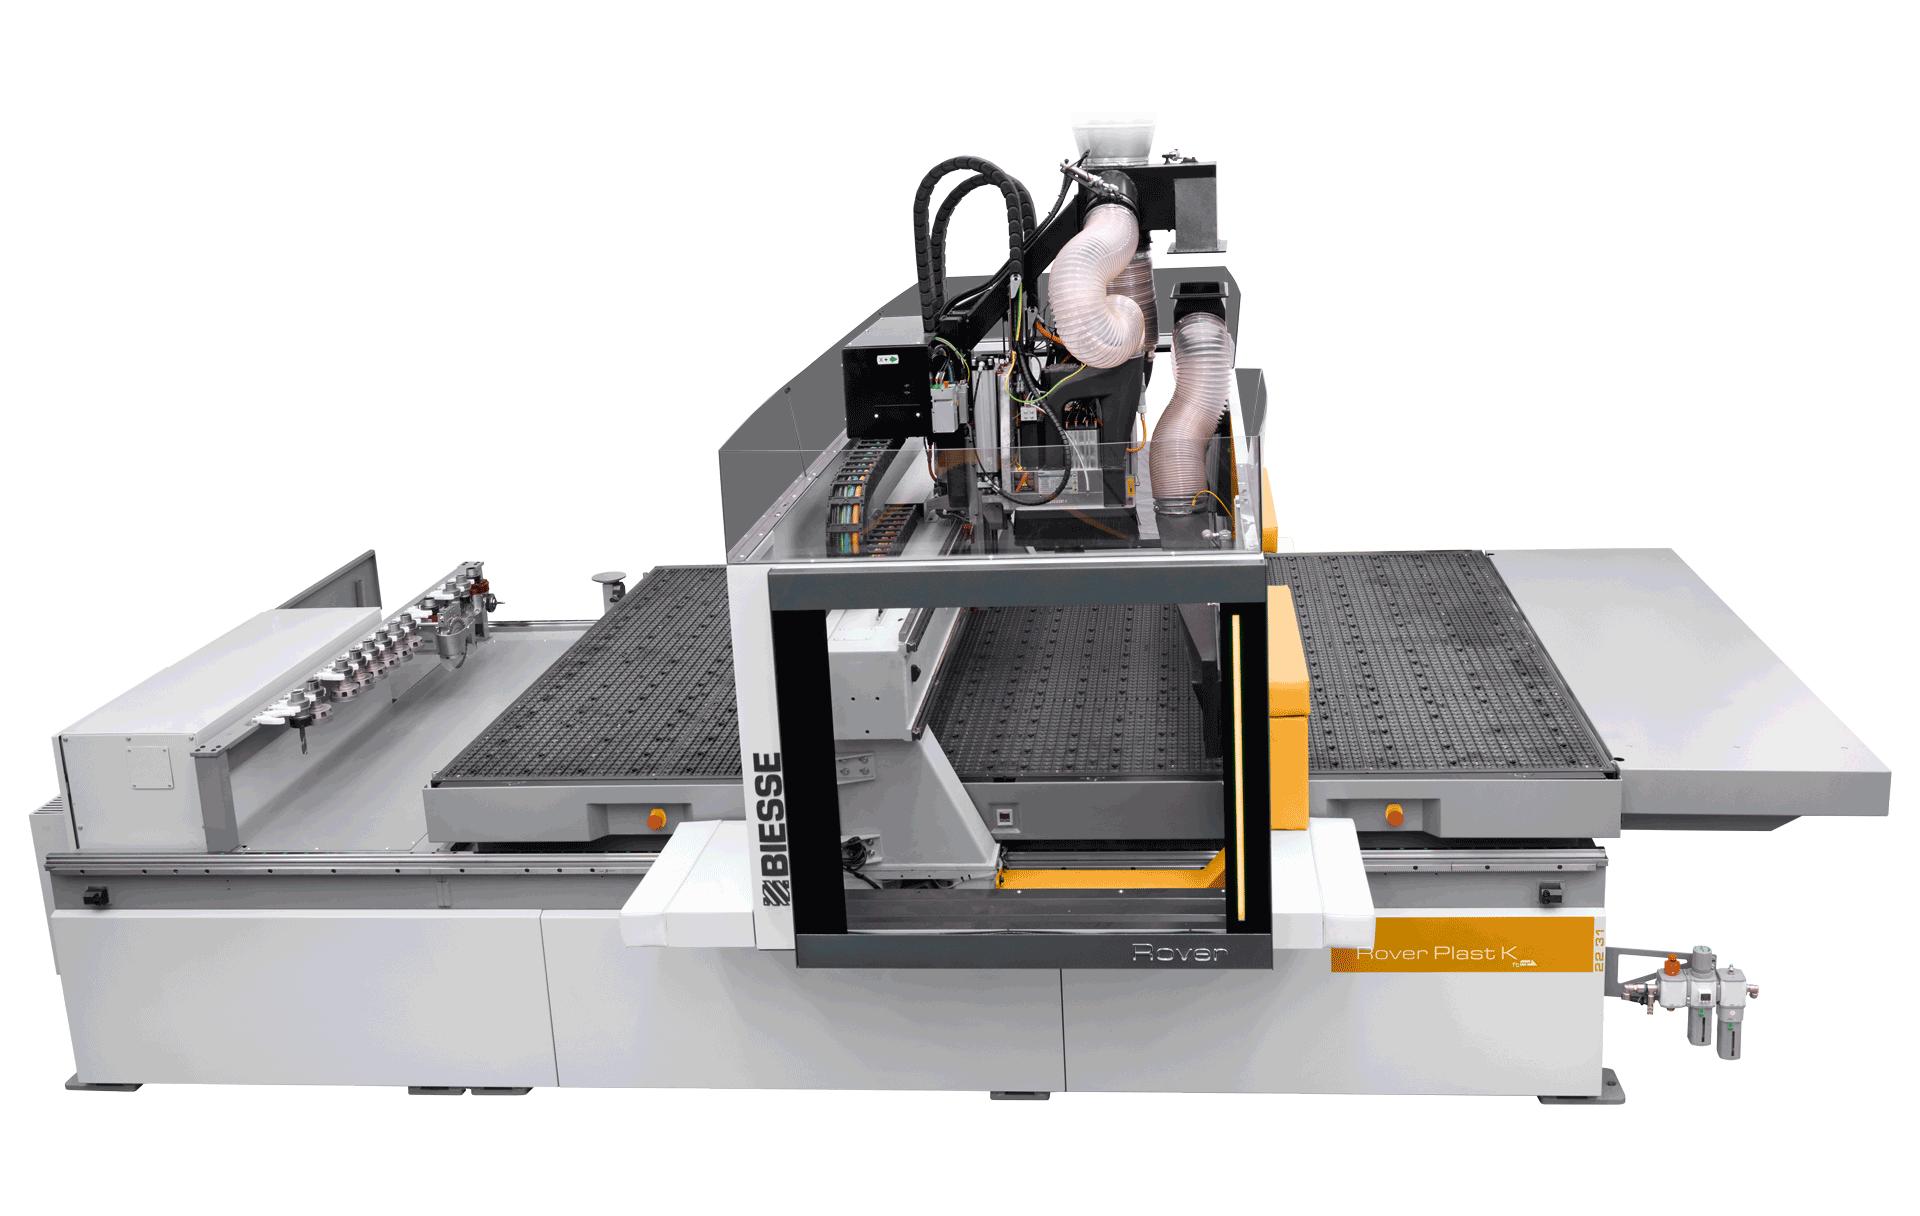 5 axis cnc machine plastic ROVER PLAST K FT: Photo 2